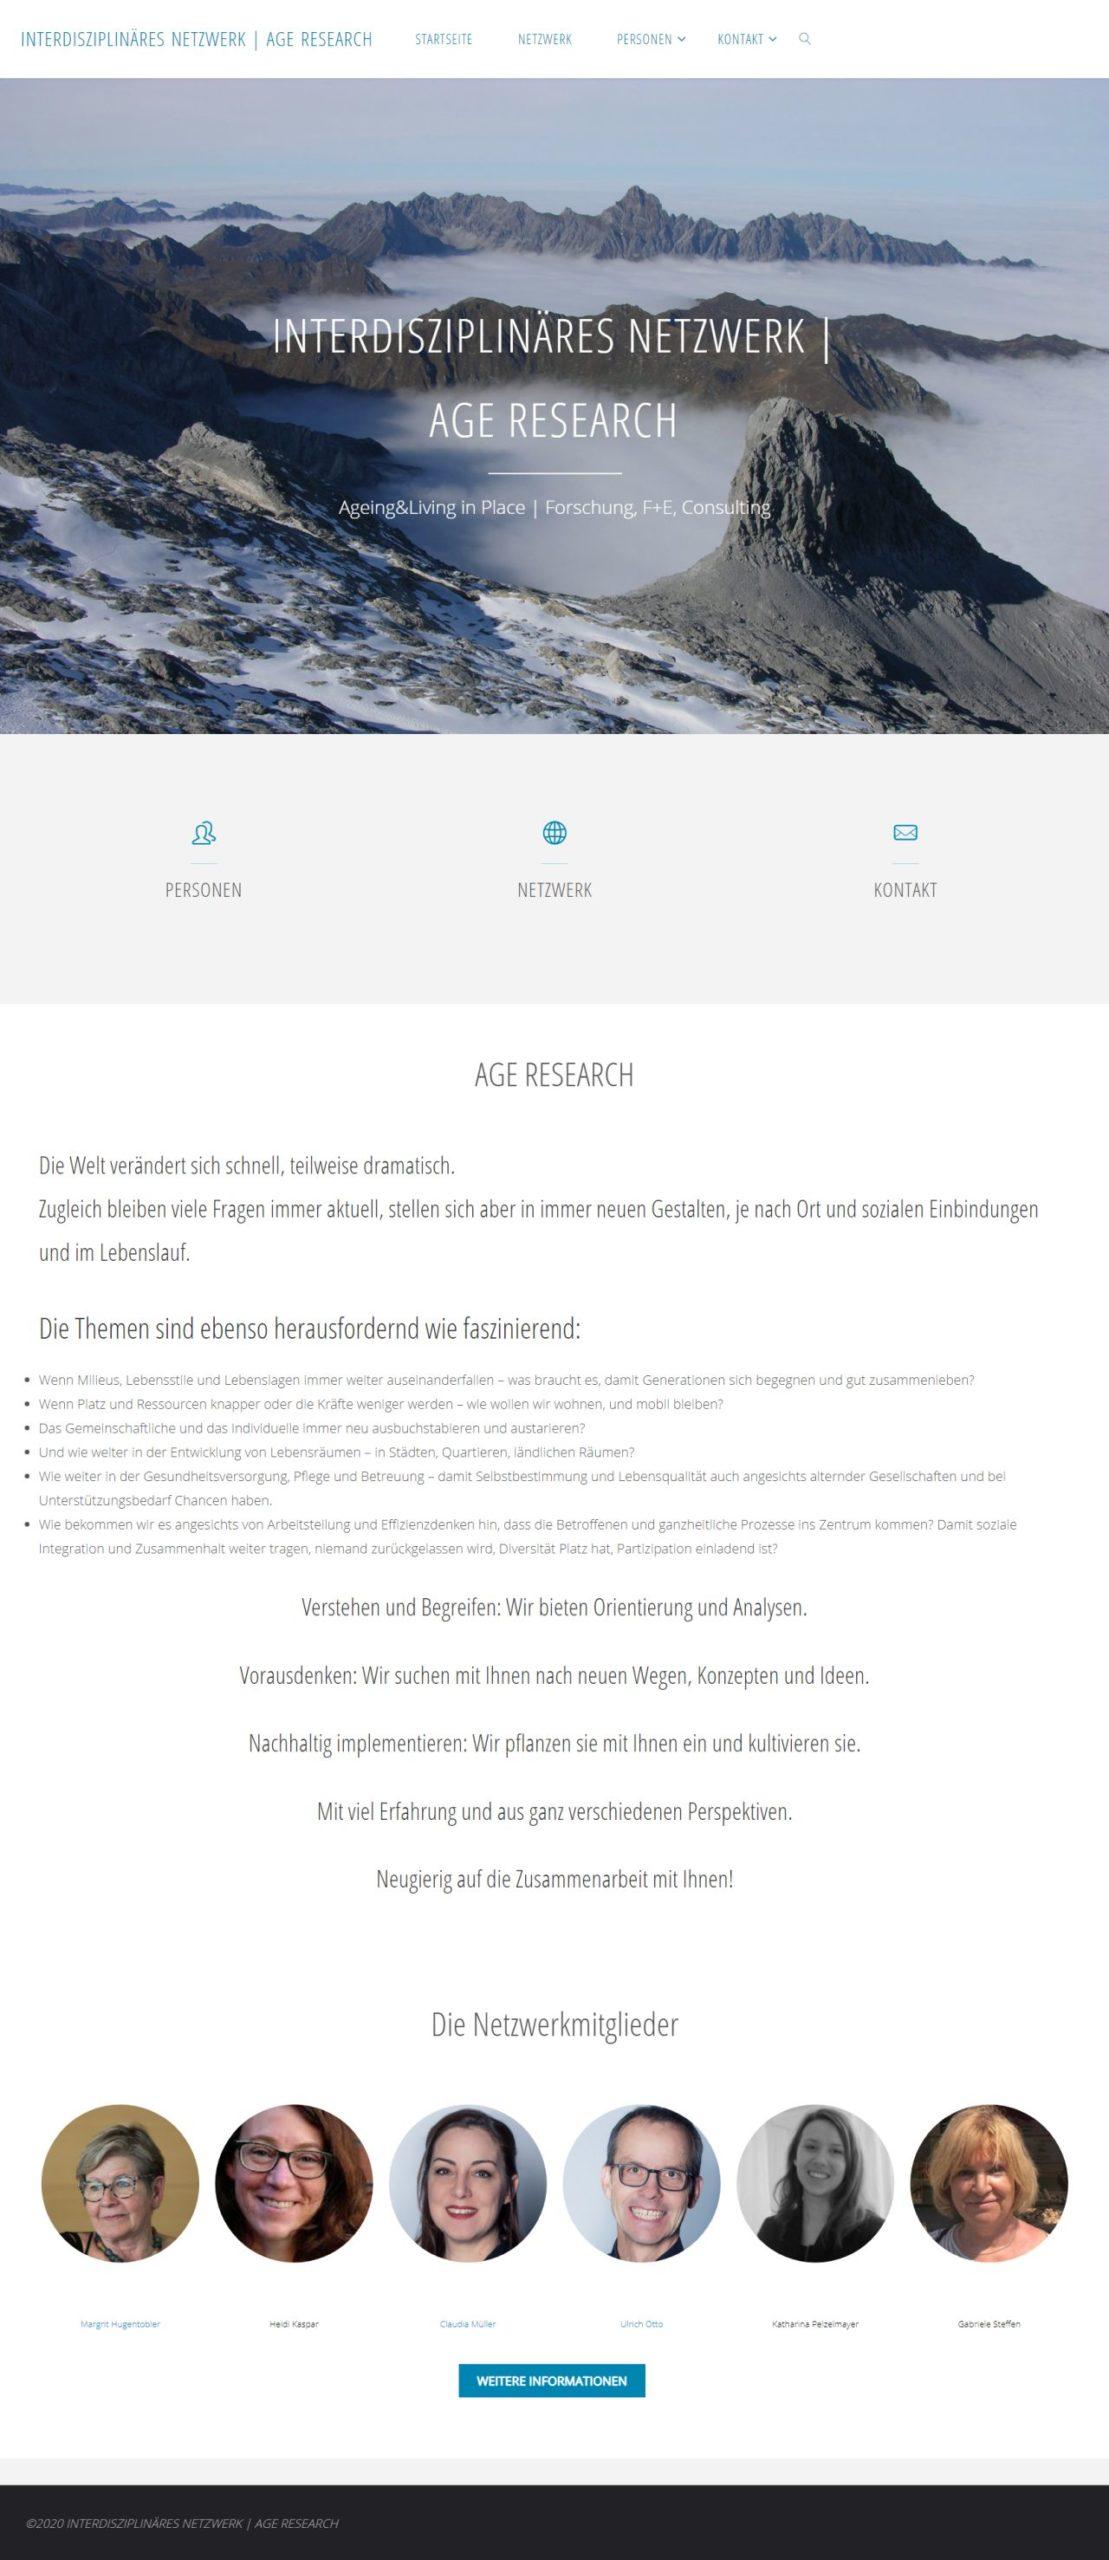 INTERDISZIPLINÄRES NETZWERK | AGE RESEARCH